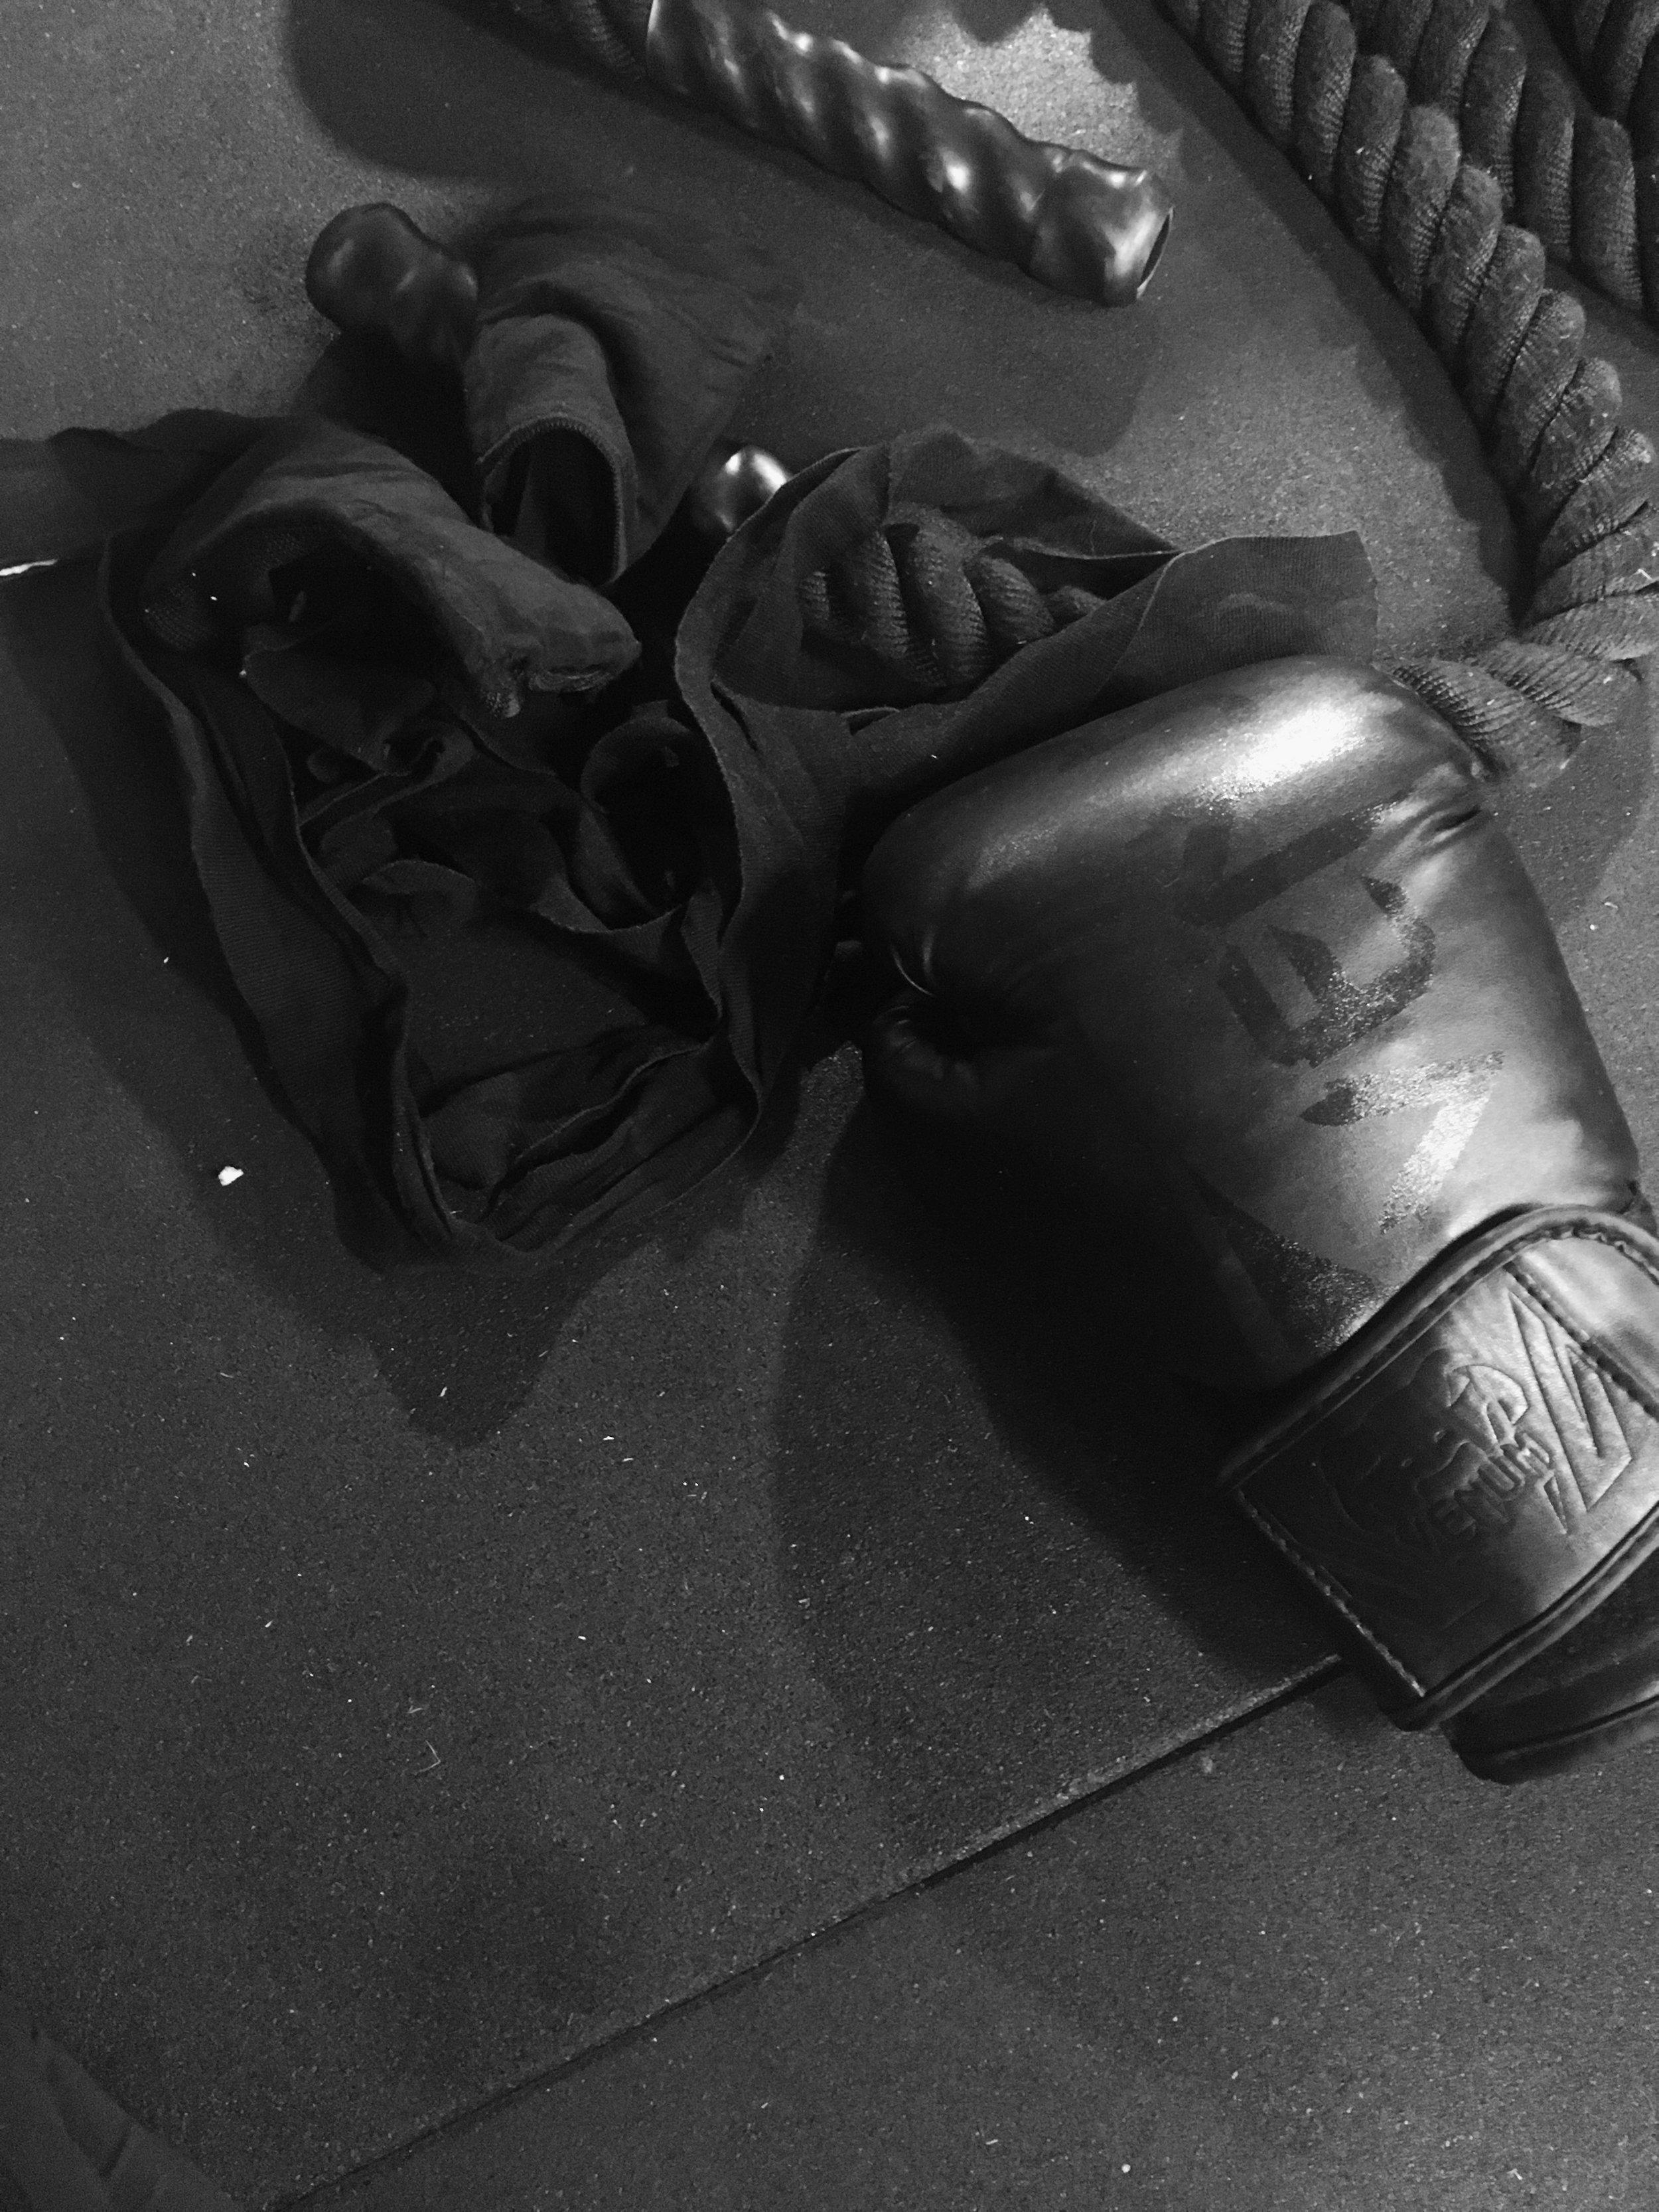 Lozidaze_Melb_Fightfit_01